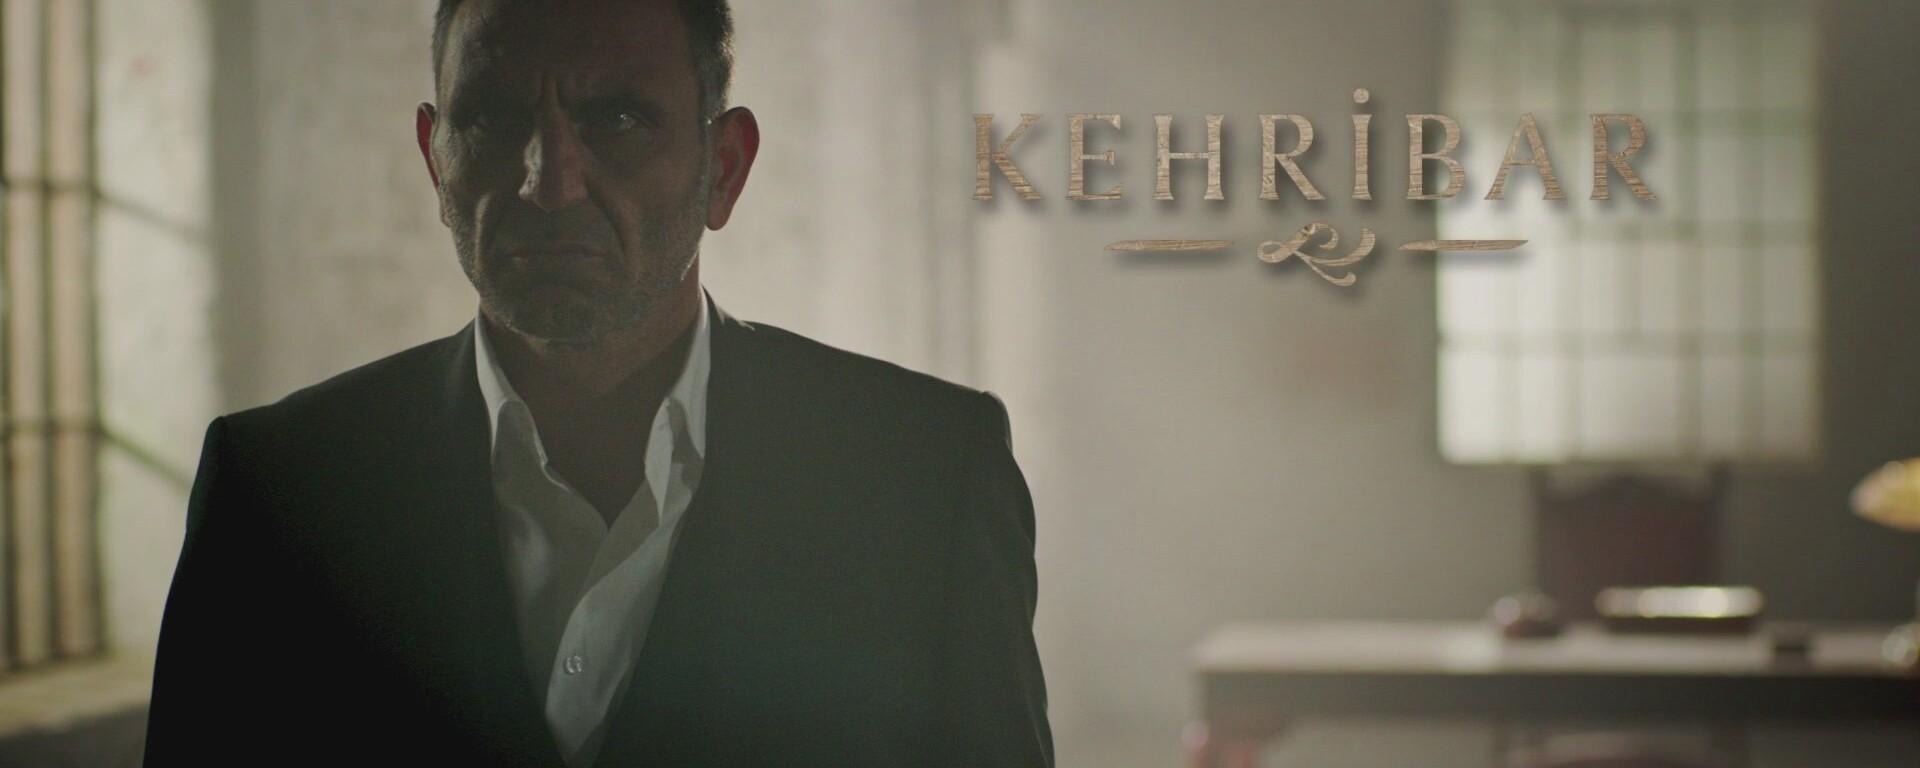 kehribar dizi film son bolum izle hd